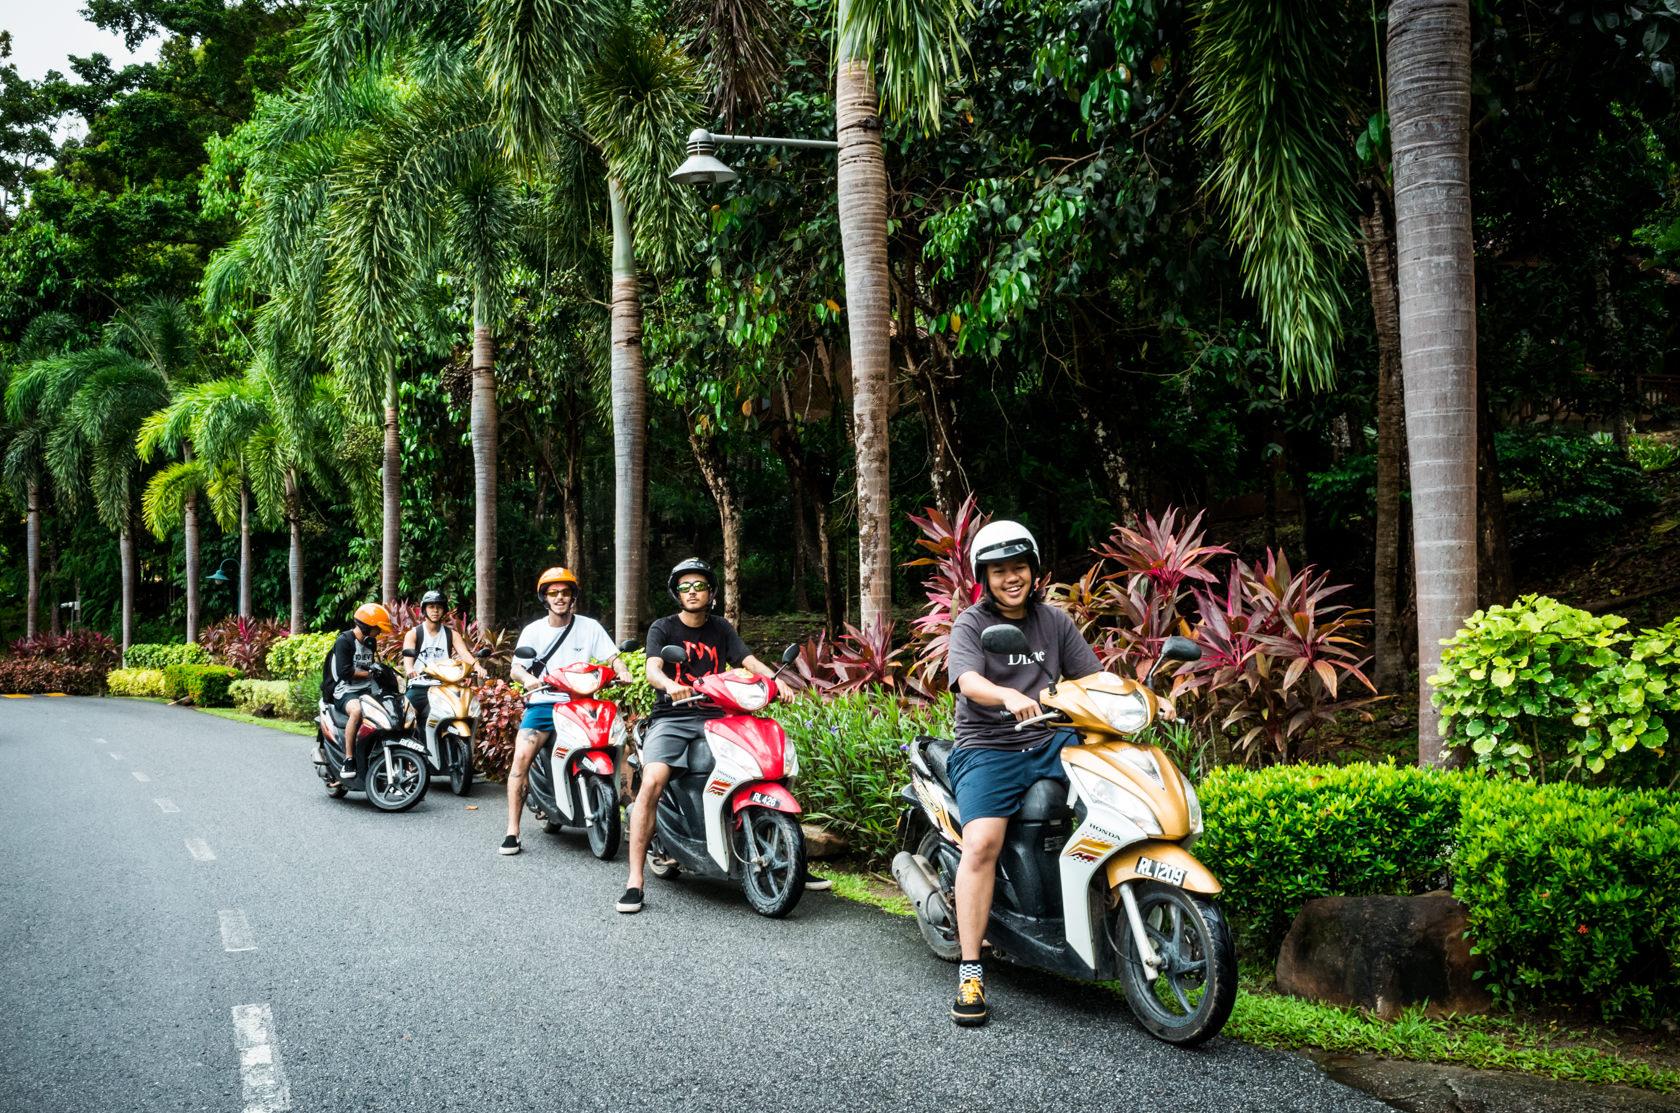 VANS_GR新加坡&马来西亚TOUR025171130-2.jpg